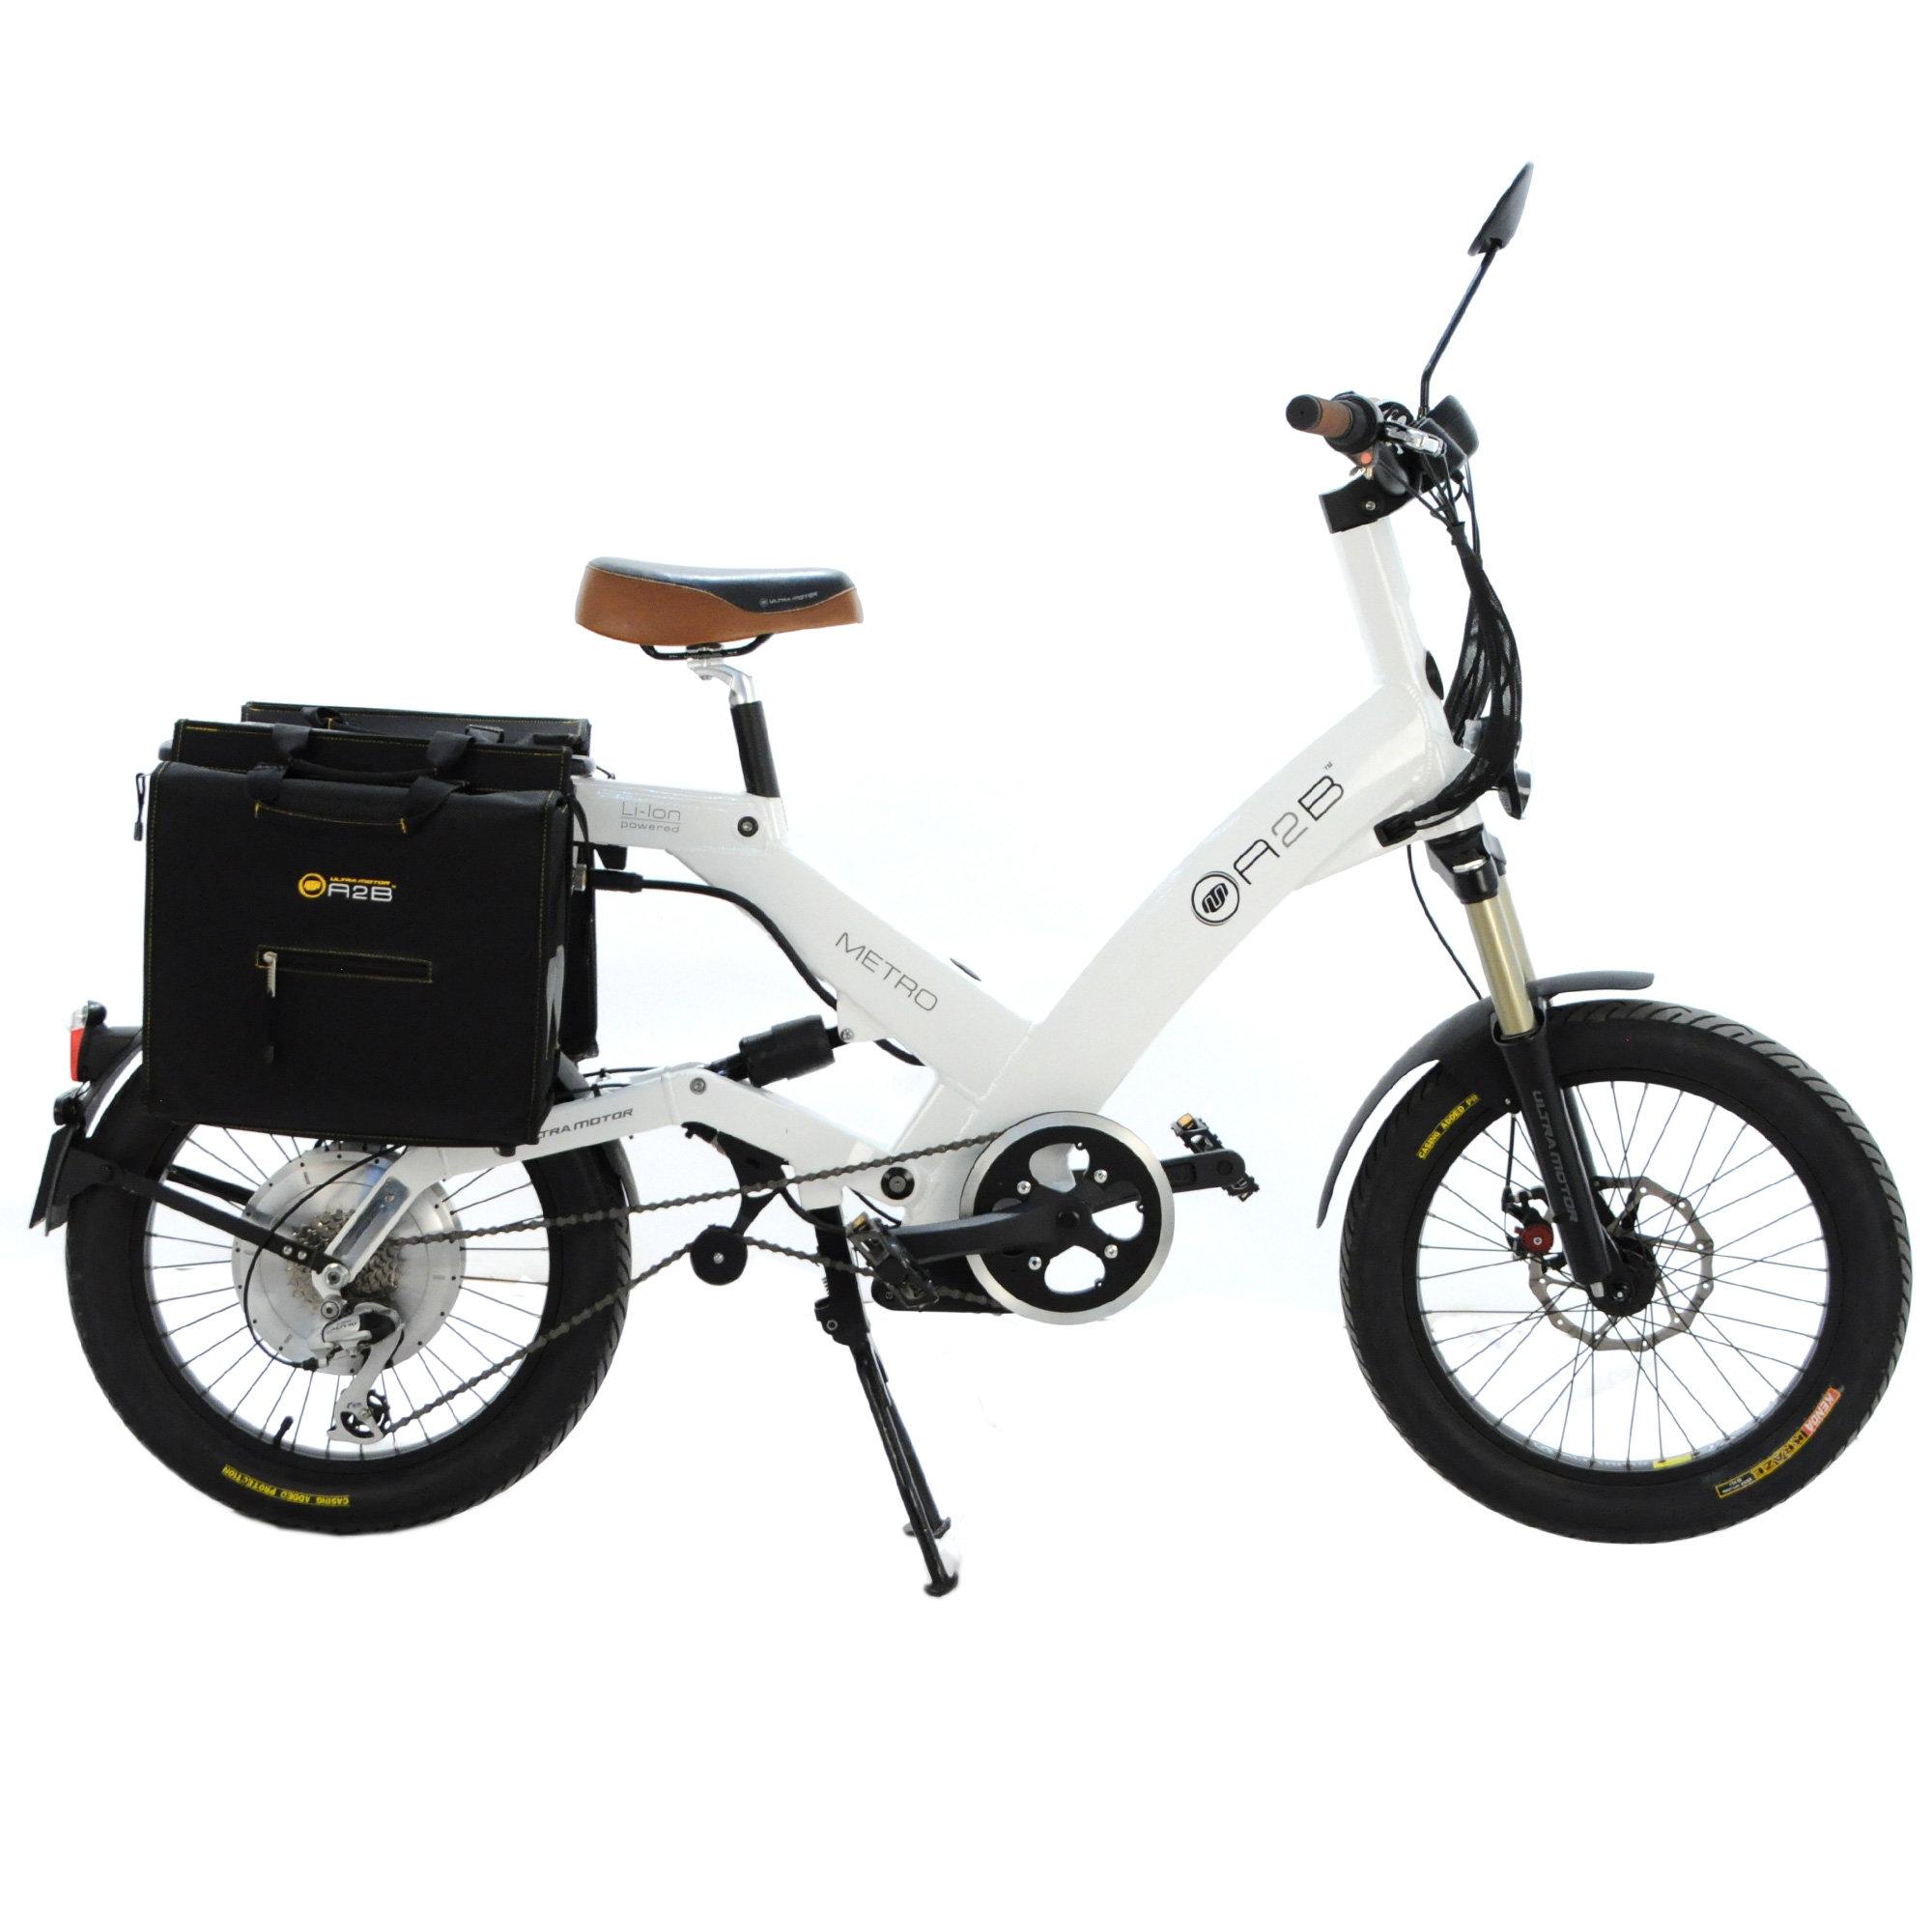 A2b Electric Bike >> Metro Electric Bike